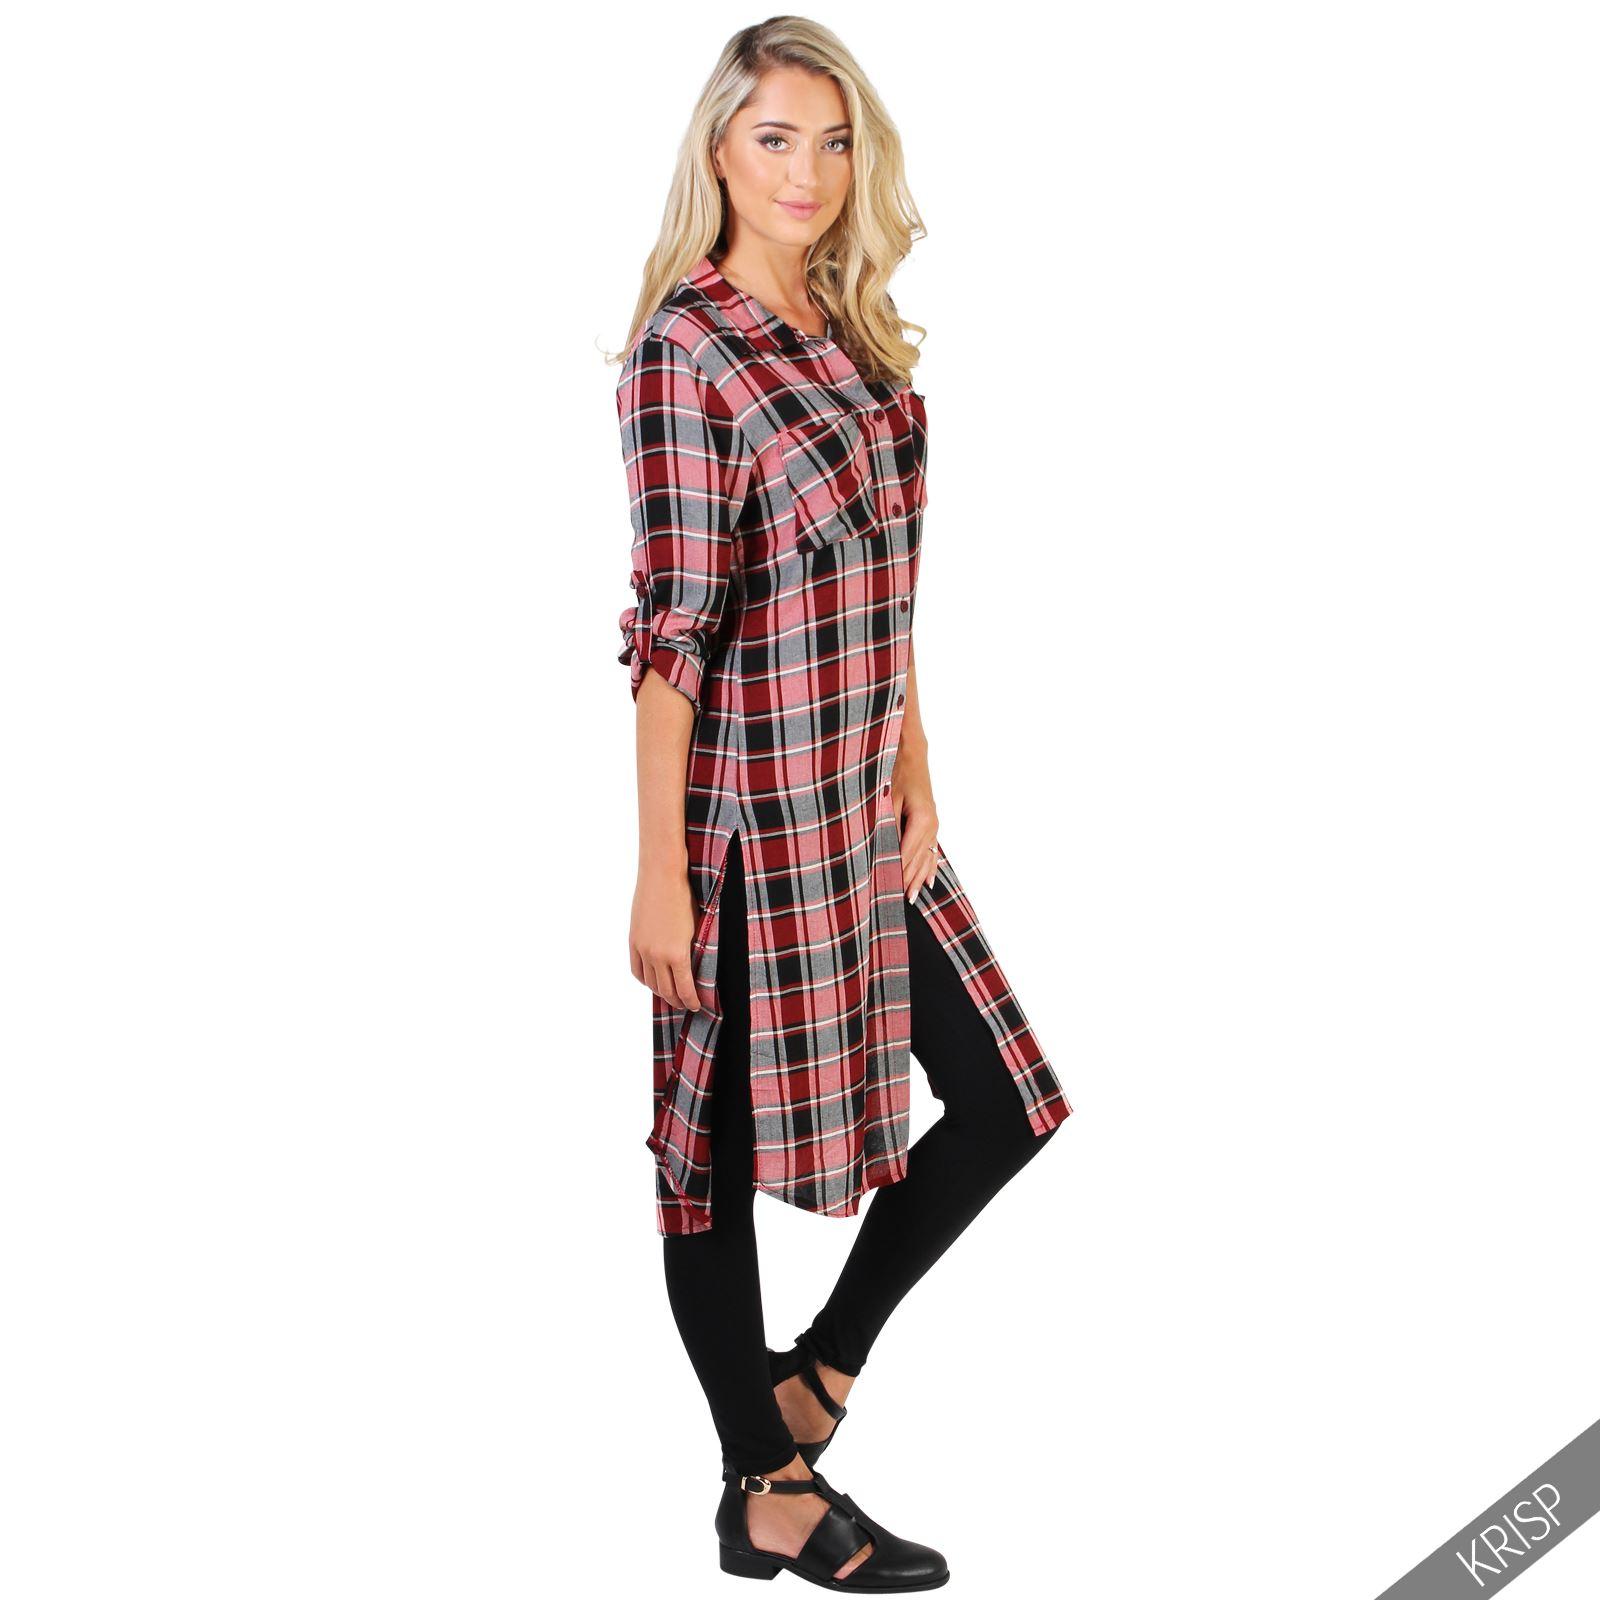 Womens ladies check plaid tartan long button up shirt for Oversized plaid shirt womens